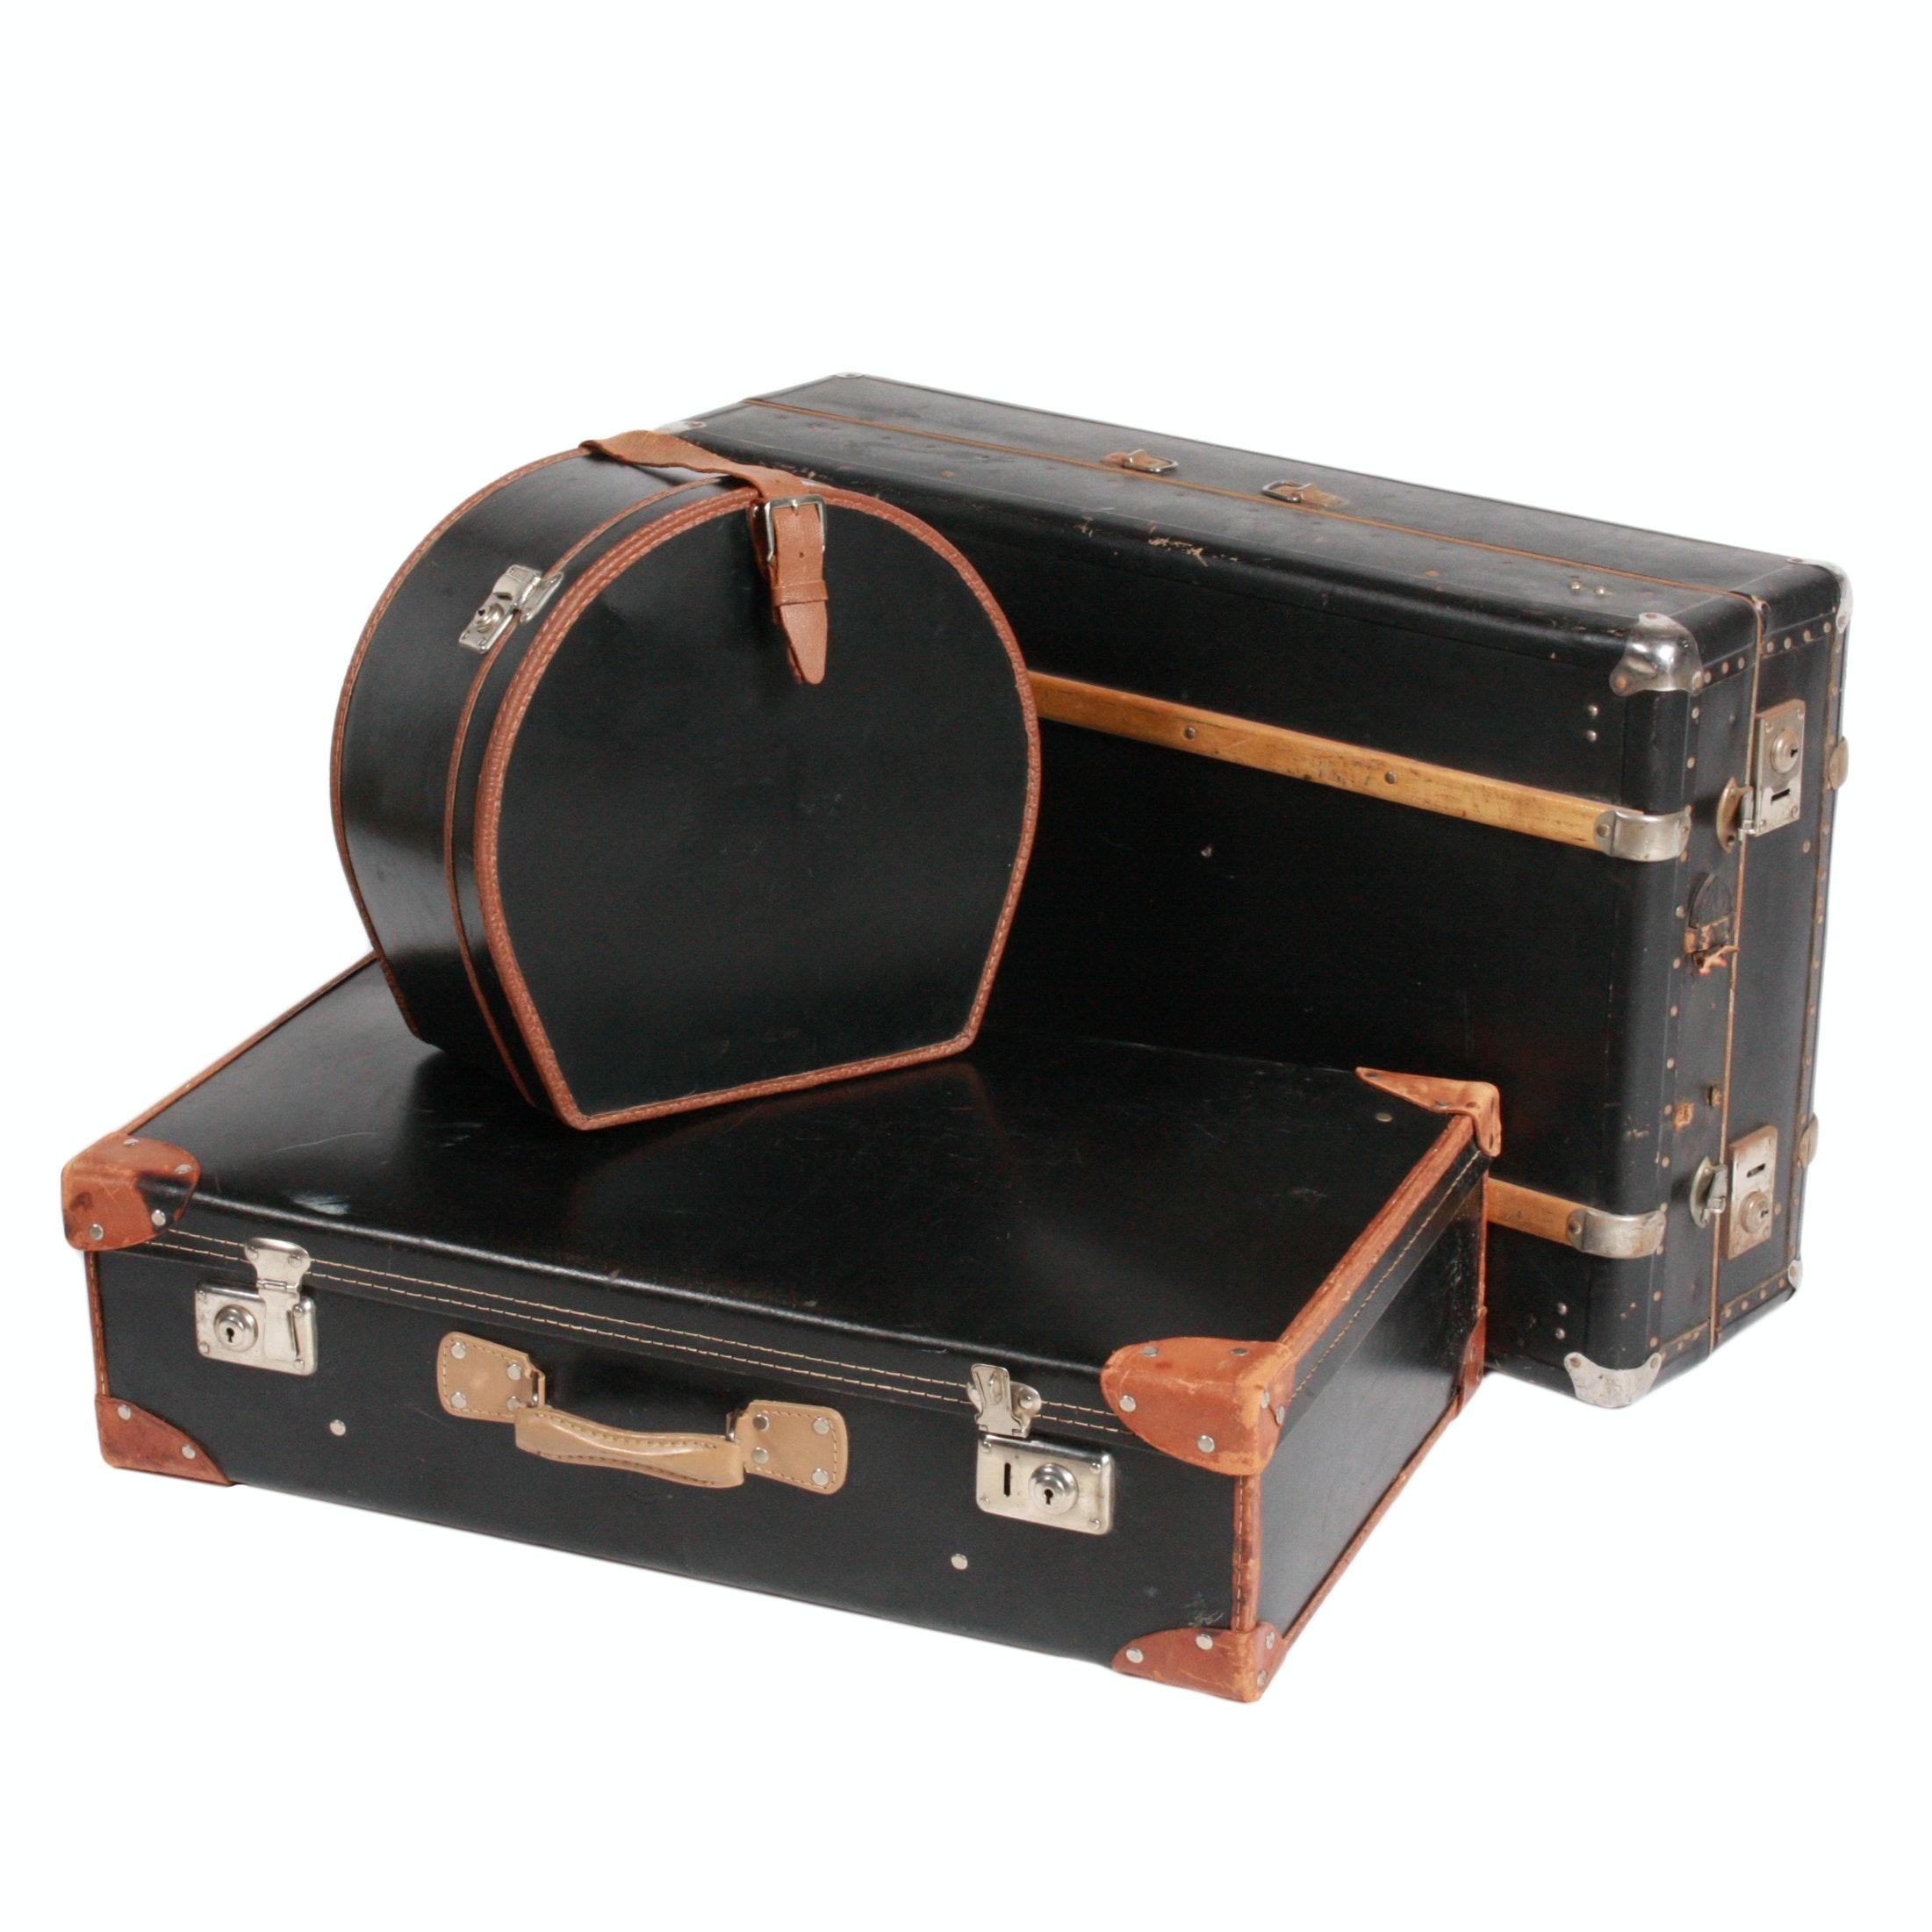 Vintage Luggage Featuring Paul U. Bergström